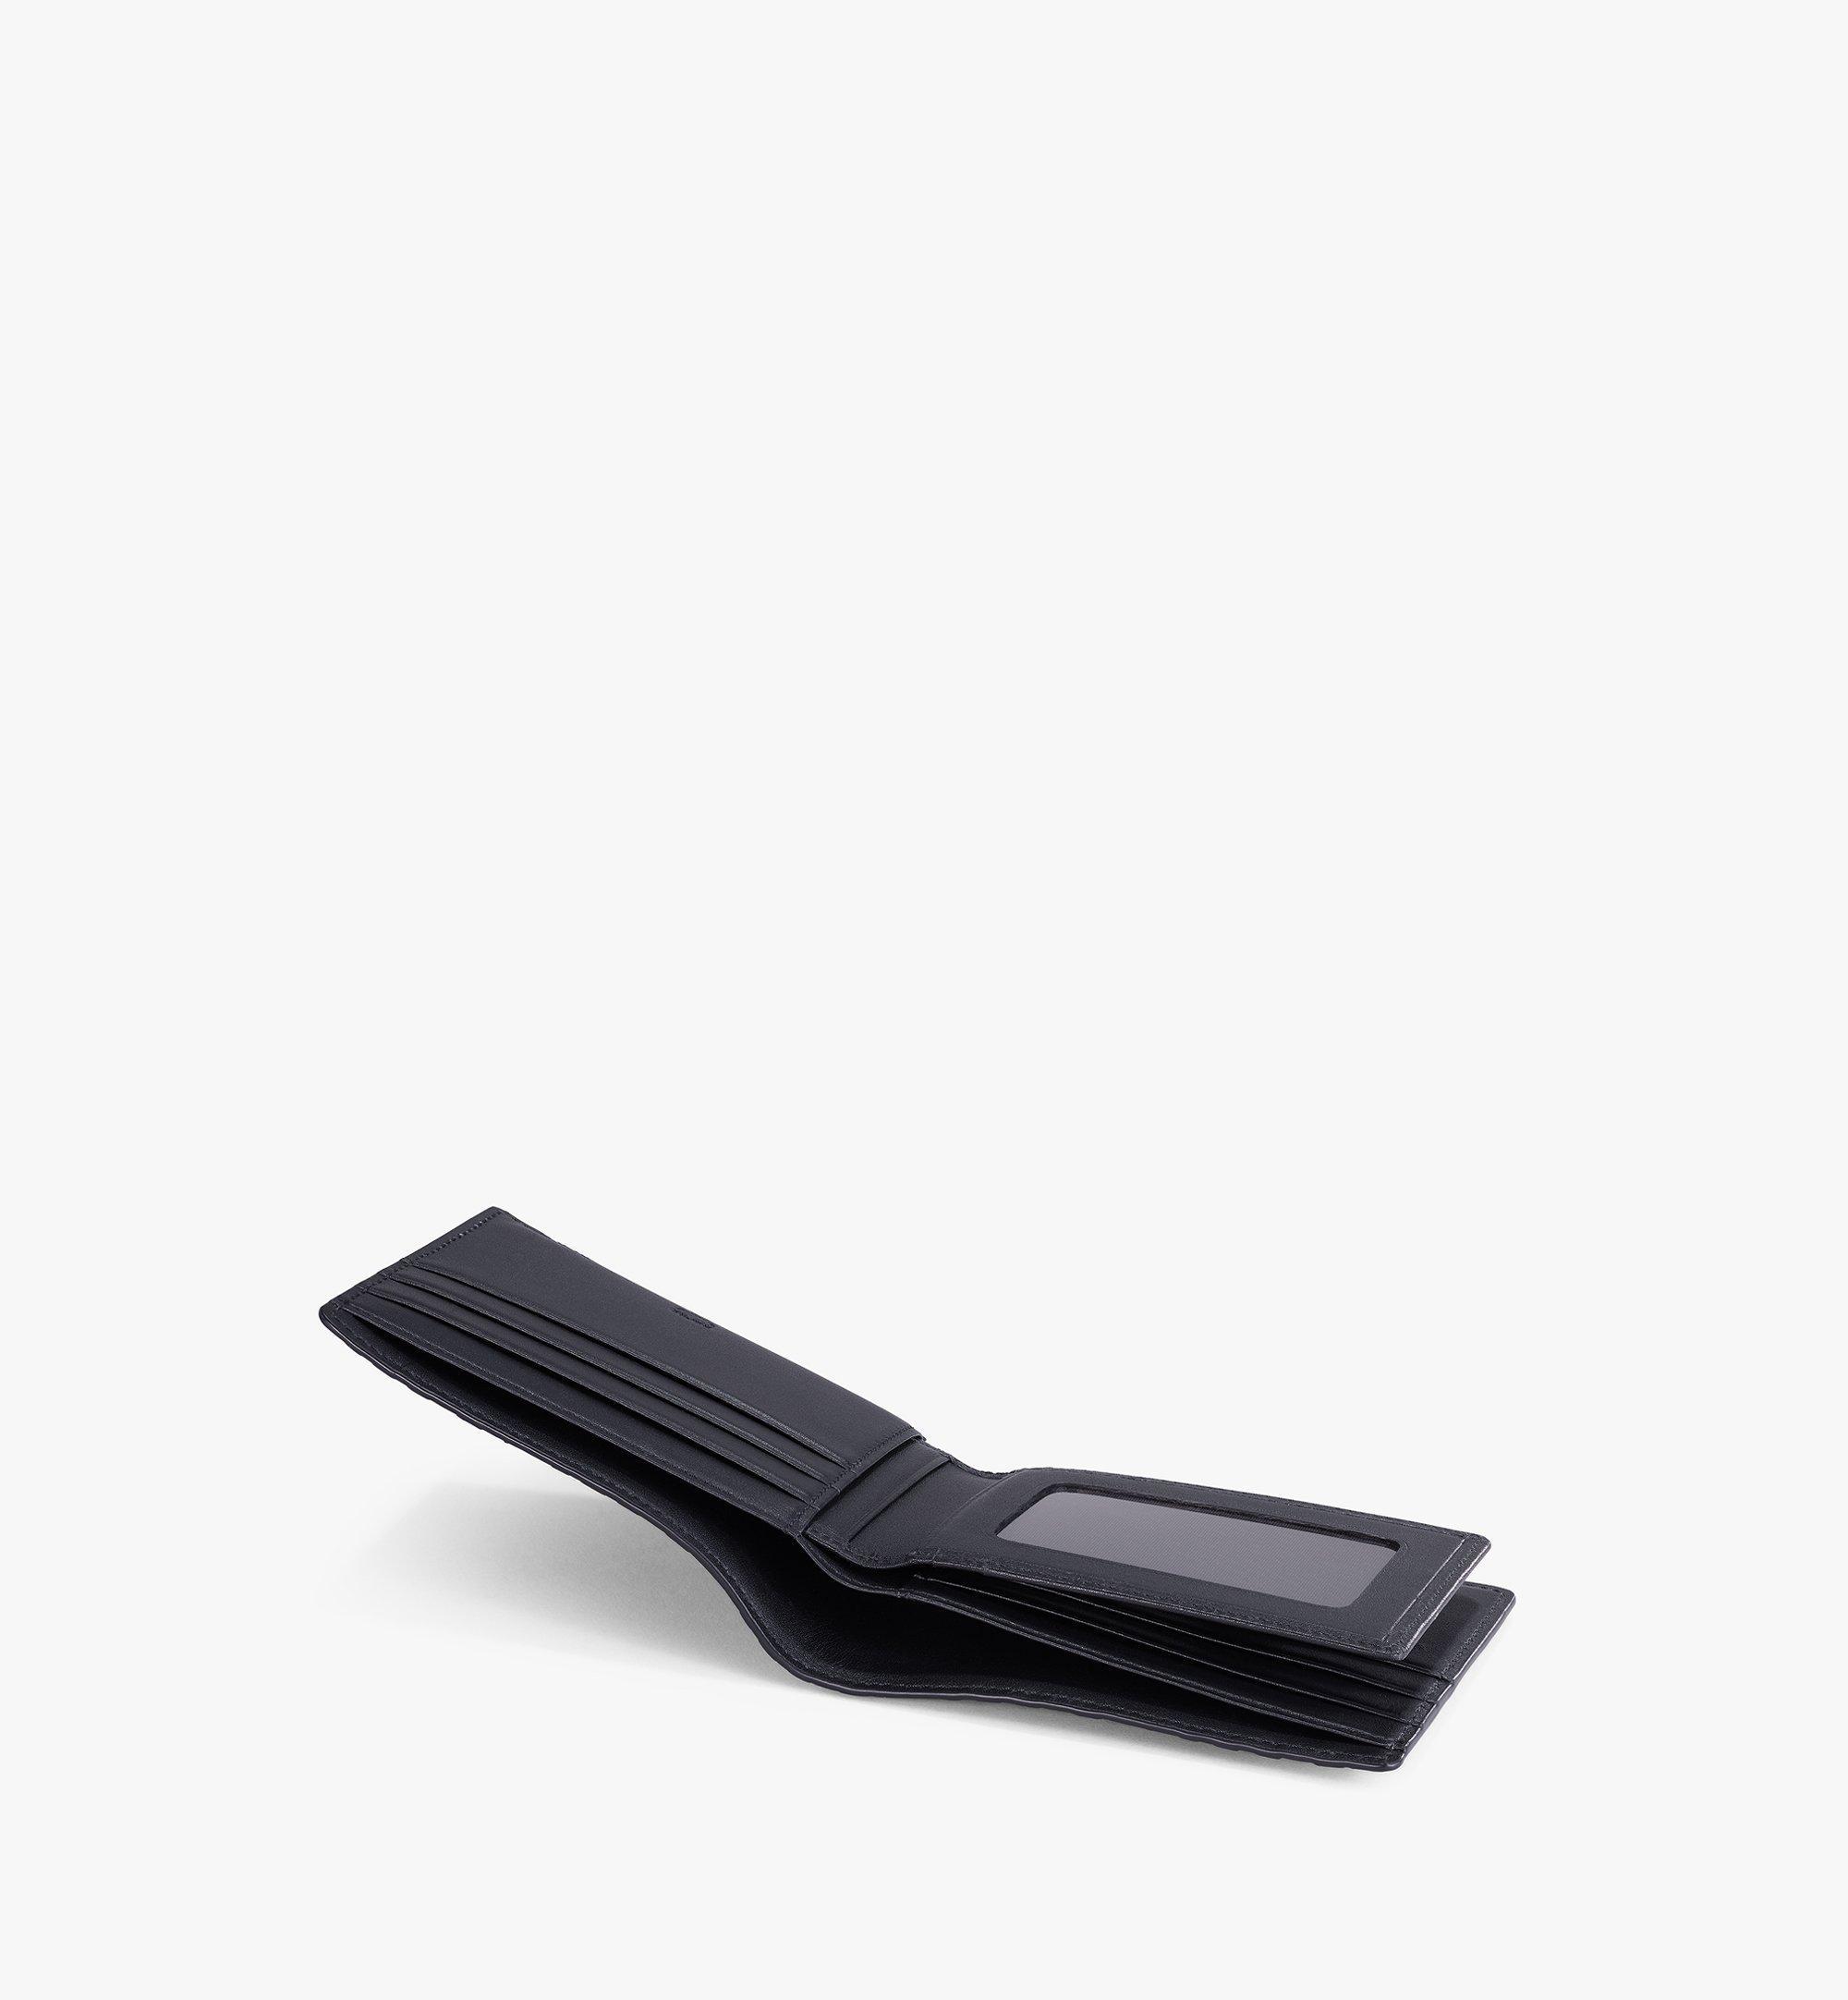 MCM Bifold Wallet in MCM Monogram Leather Black MXSAAMD01BK001 Alternate View 1